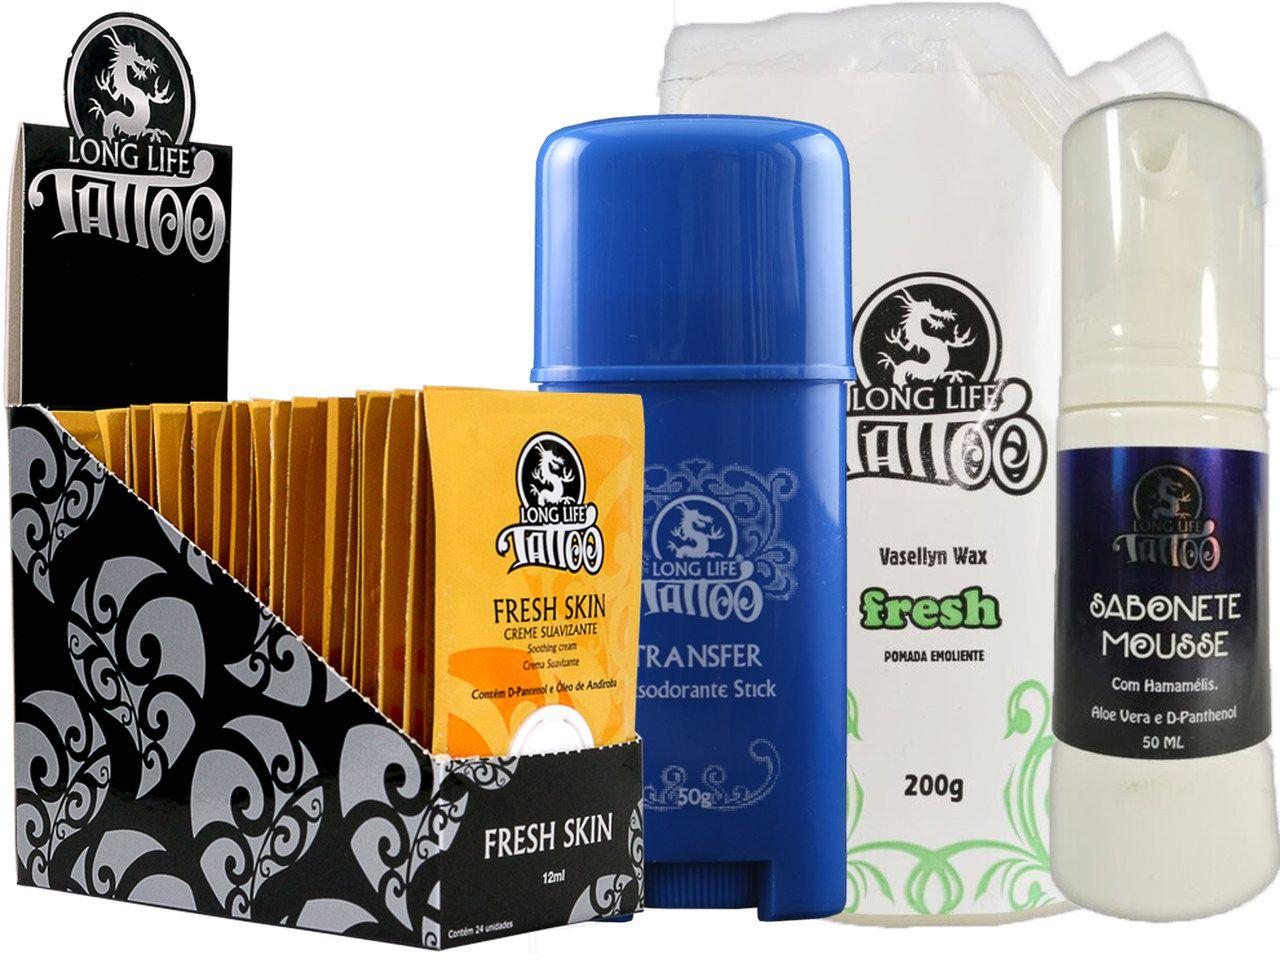 Caixa Fresh Skin Sachê (24 un.) + Sabonete Mousse + Vasellyn Fresh 200g + Transfer Stick